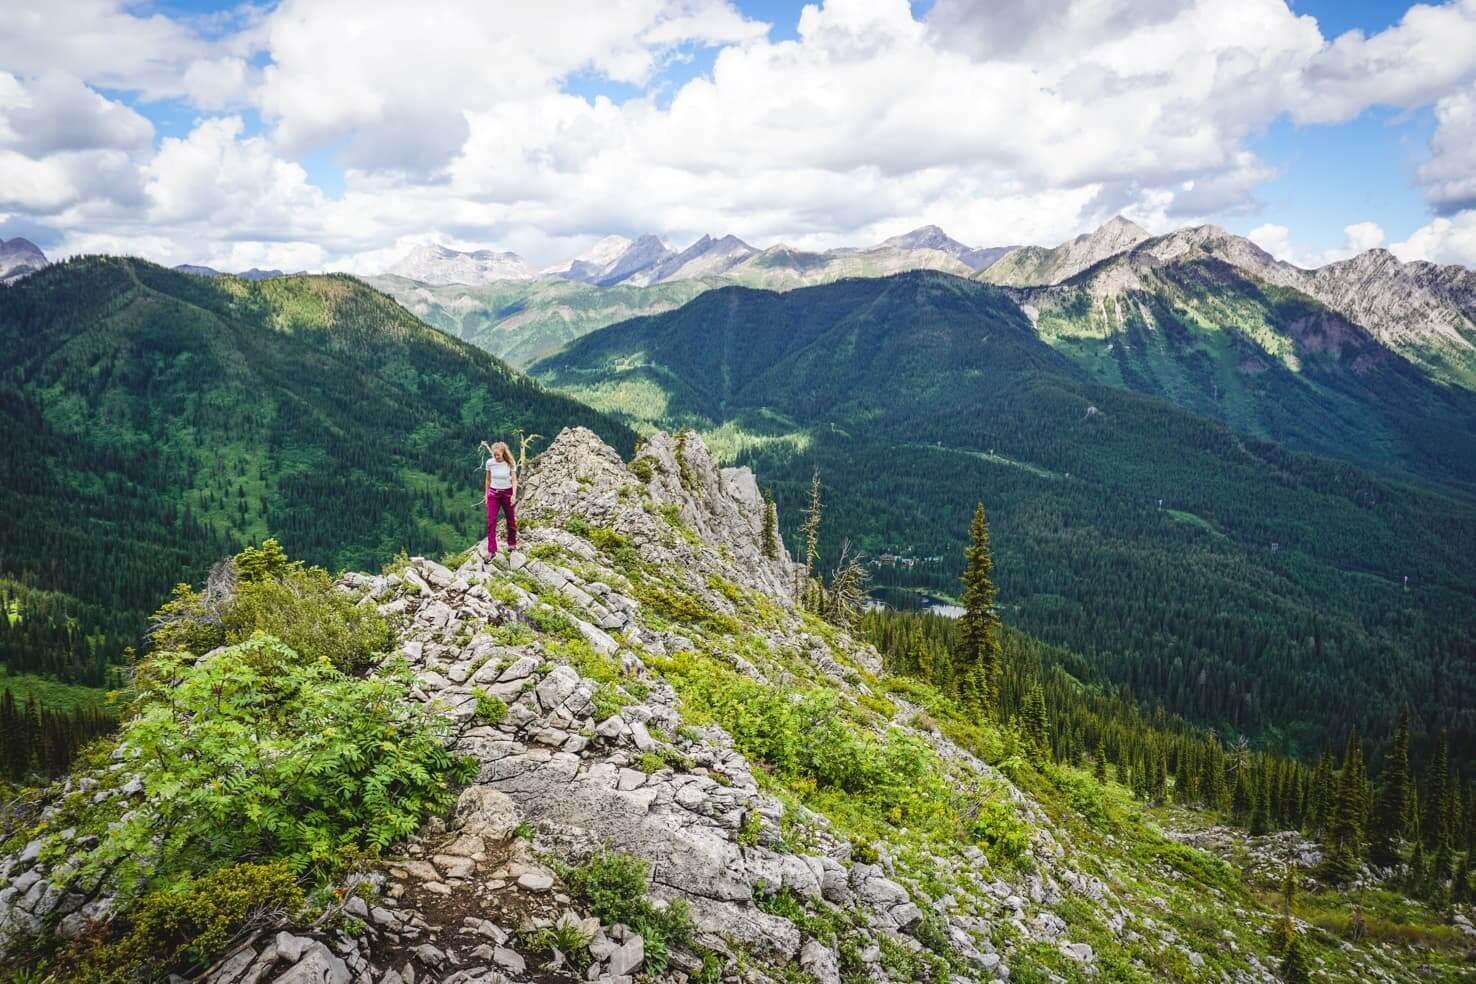 Canadian Rockies road trip itinerary - Fernie in British Columbia